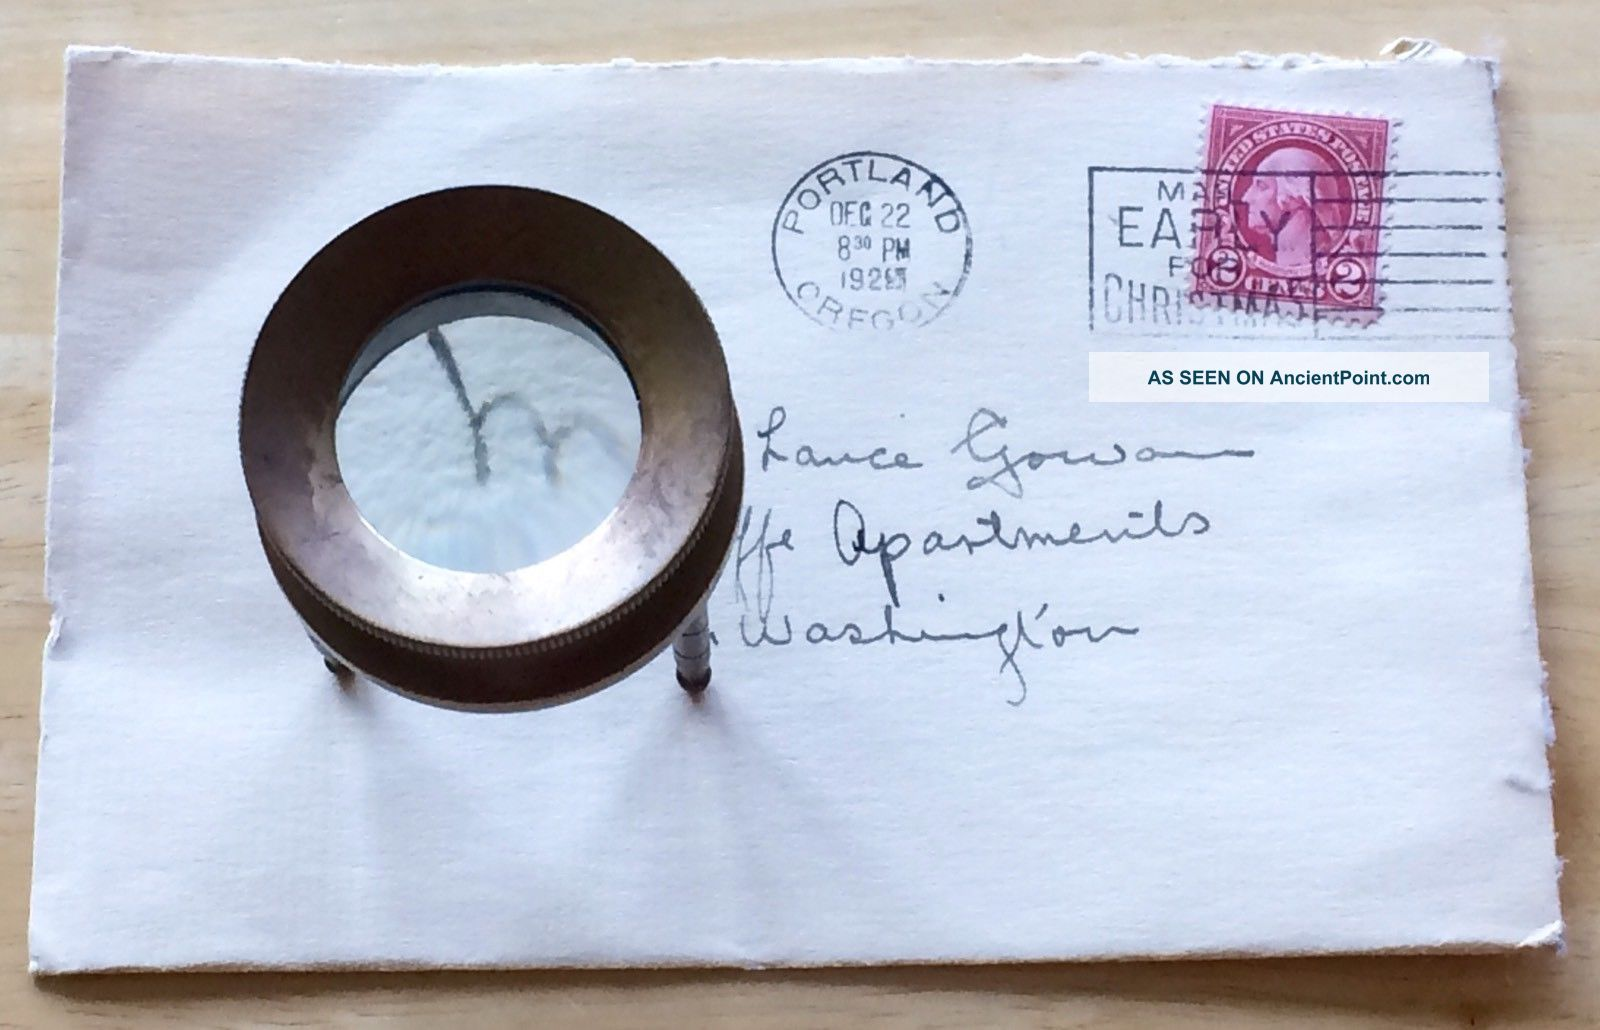 Edwardian Brass Tripod Nautical Magnifier 3 Legs Library Magnifying Glass Optical photo